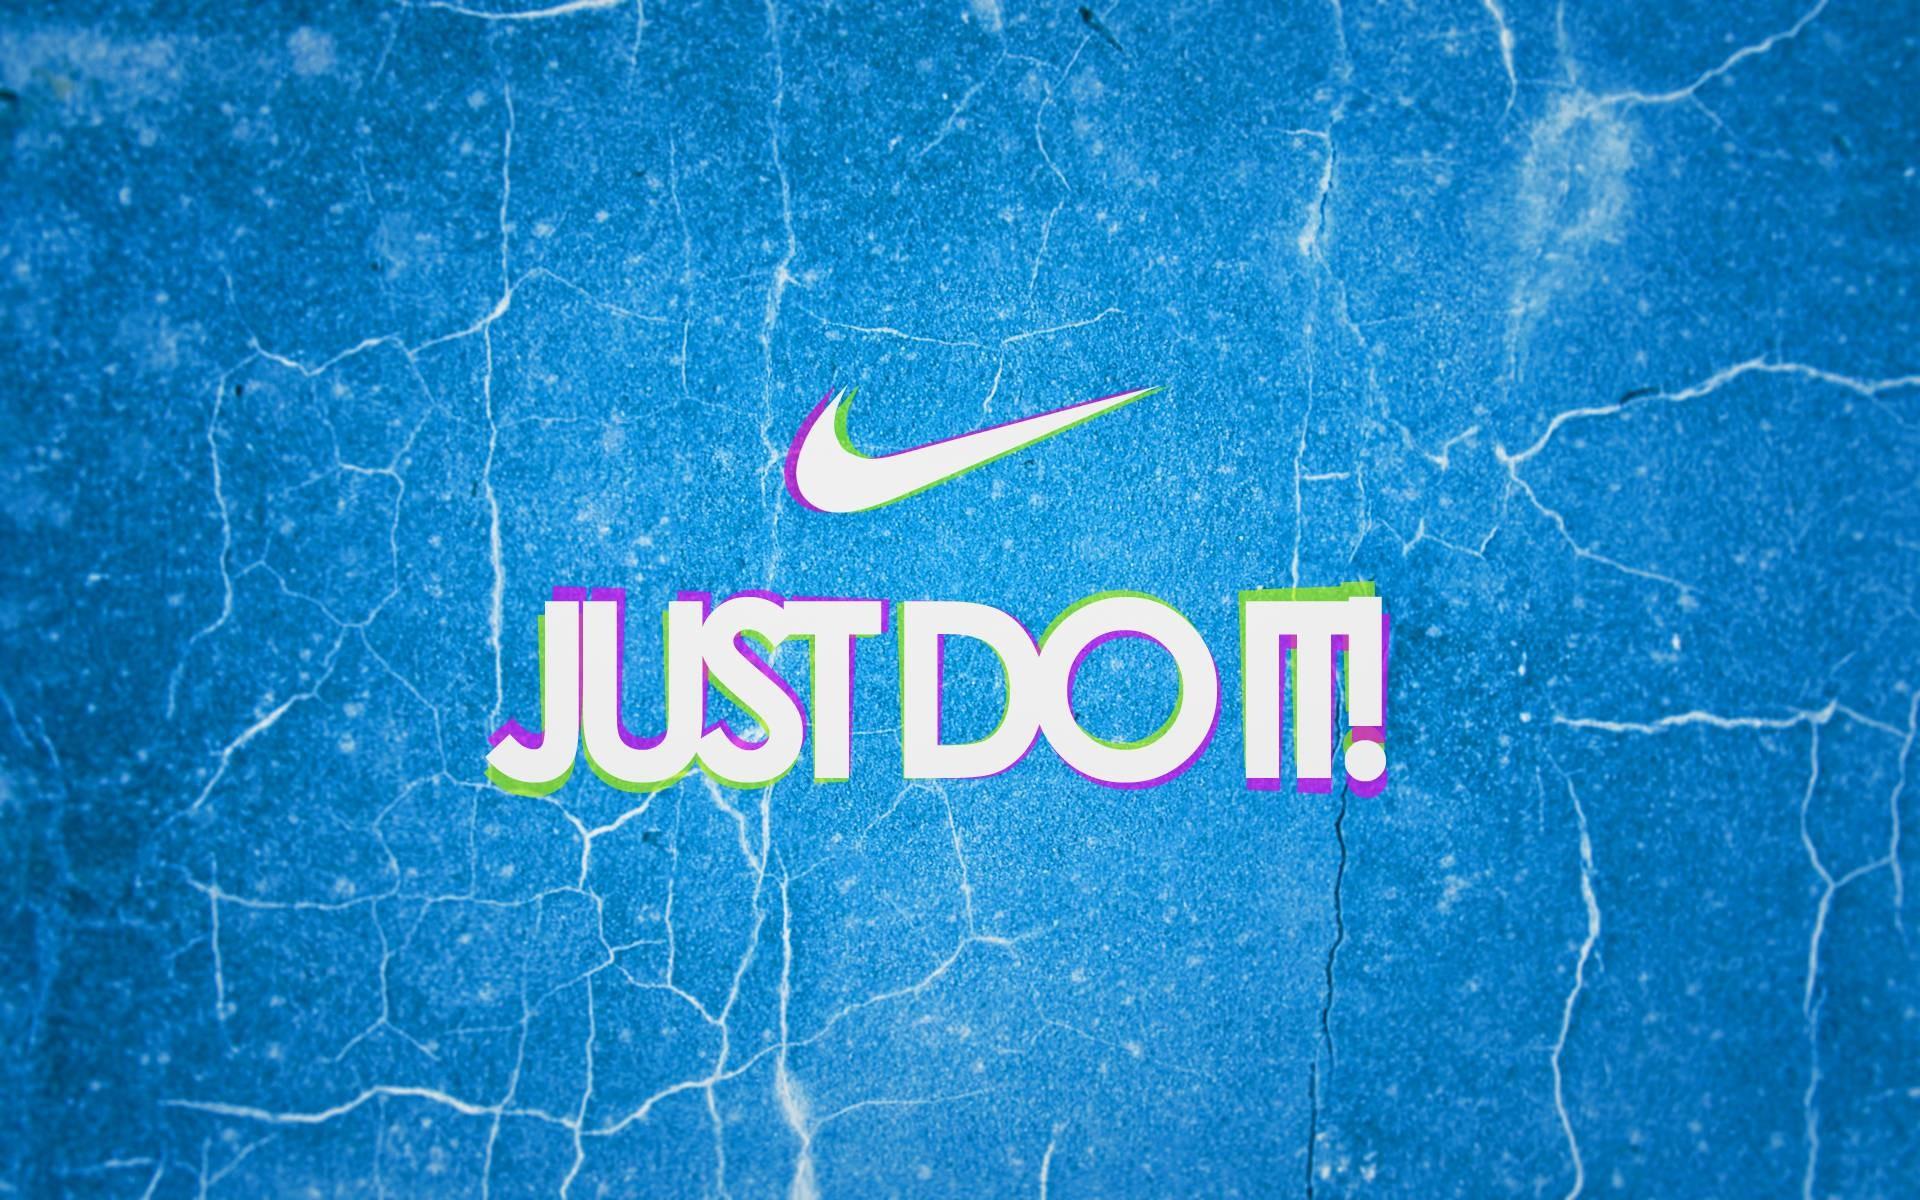 Nike Wallpapers – Full HD wallpaper search